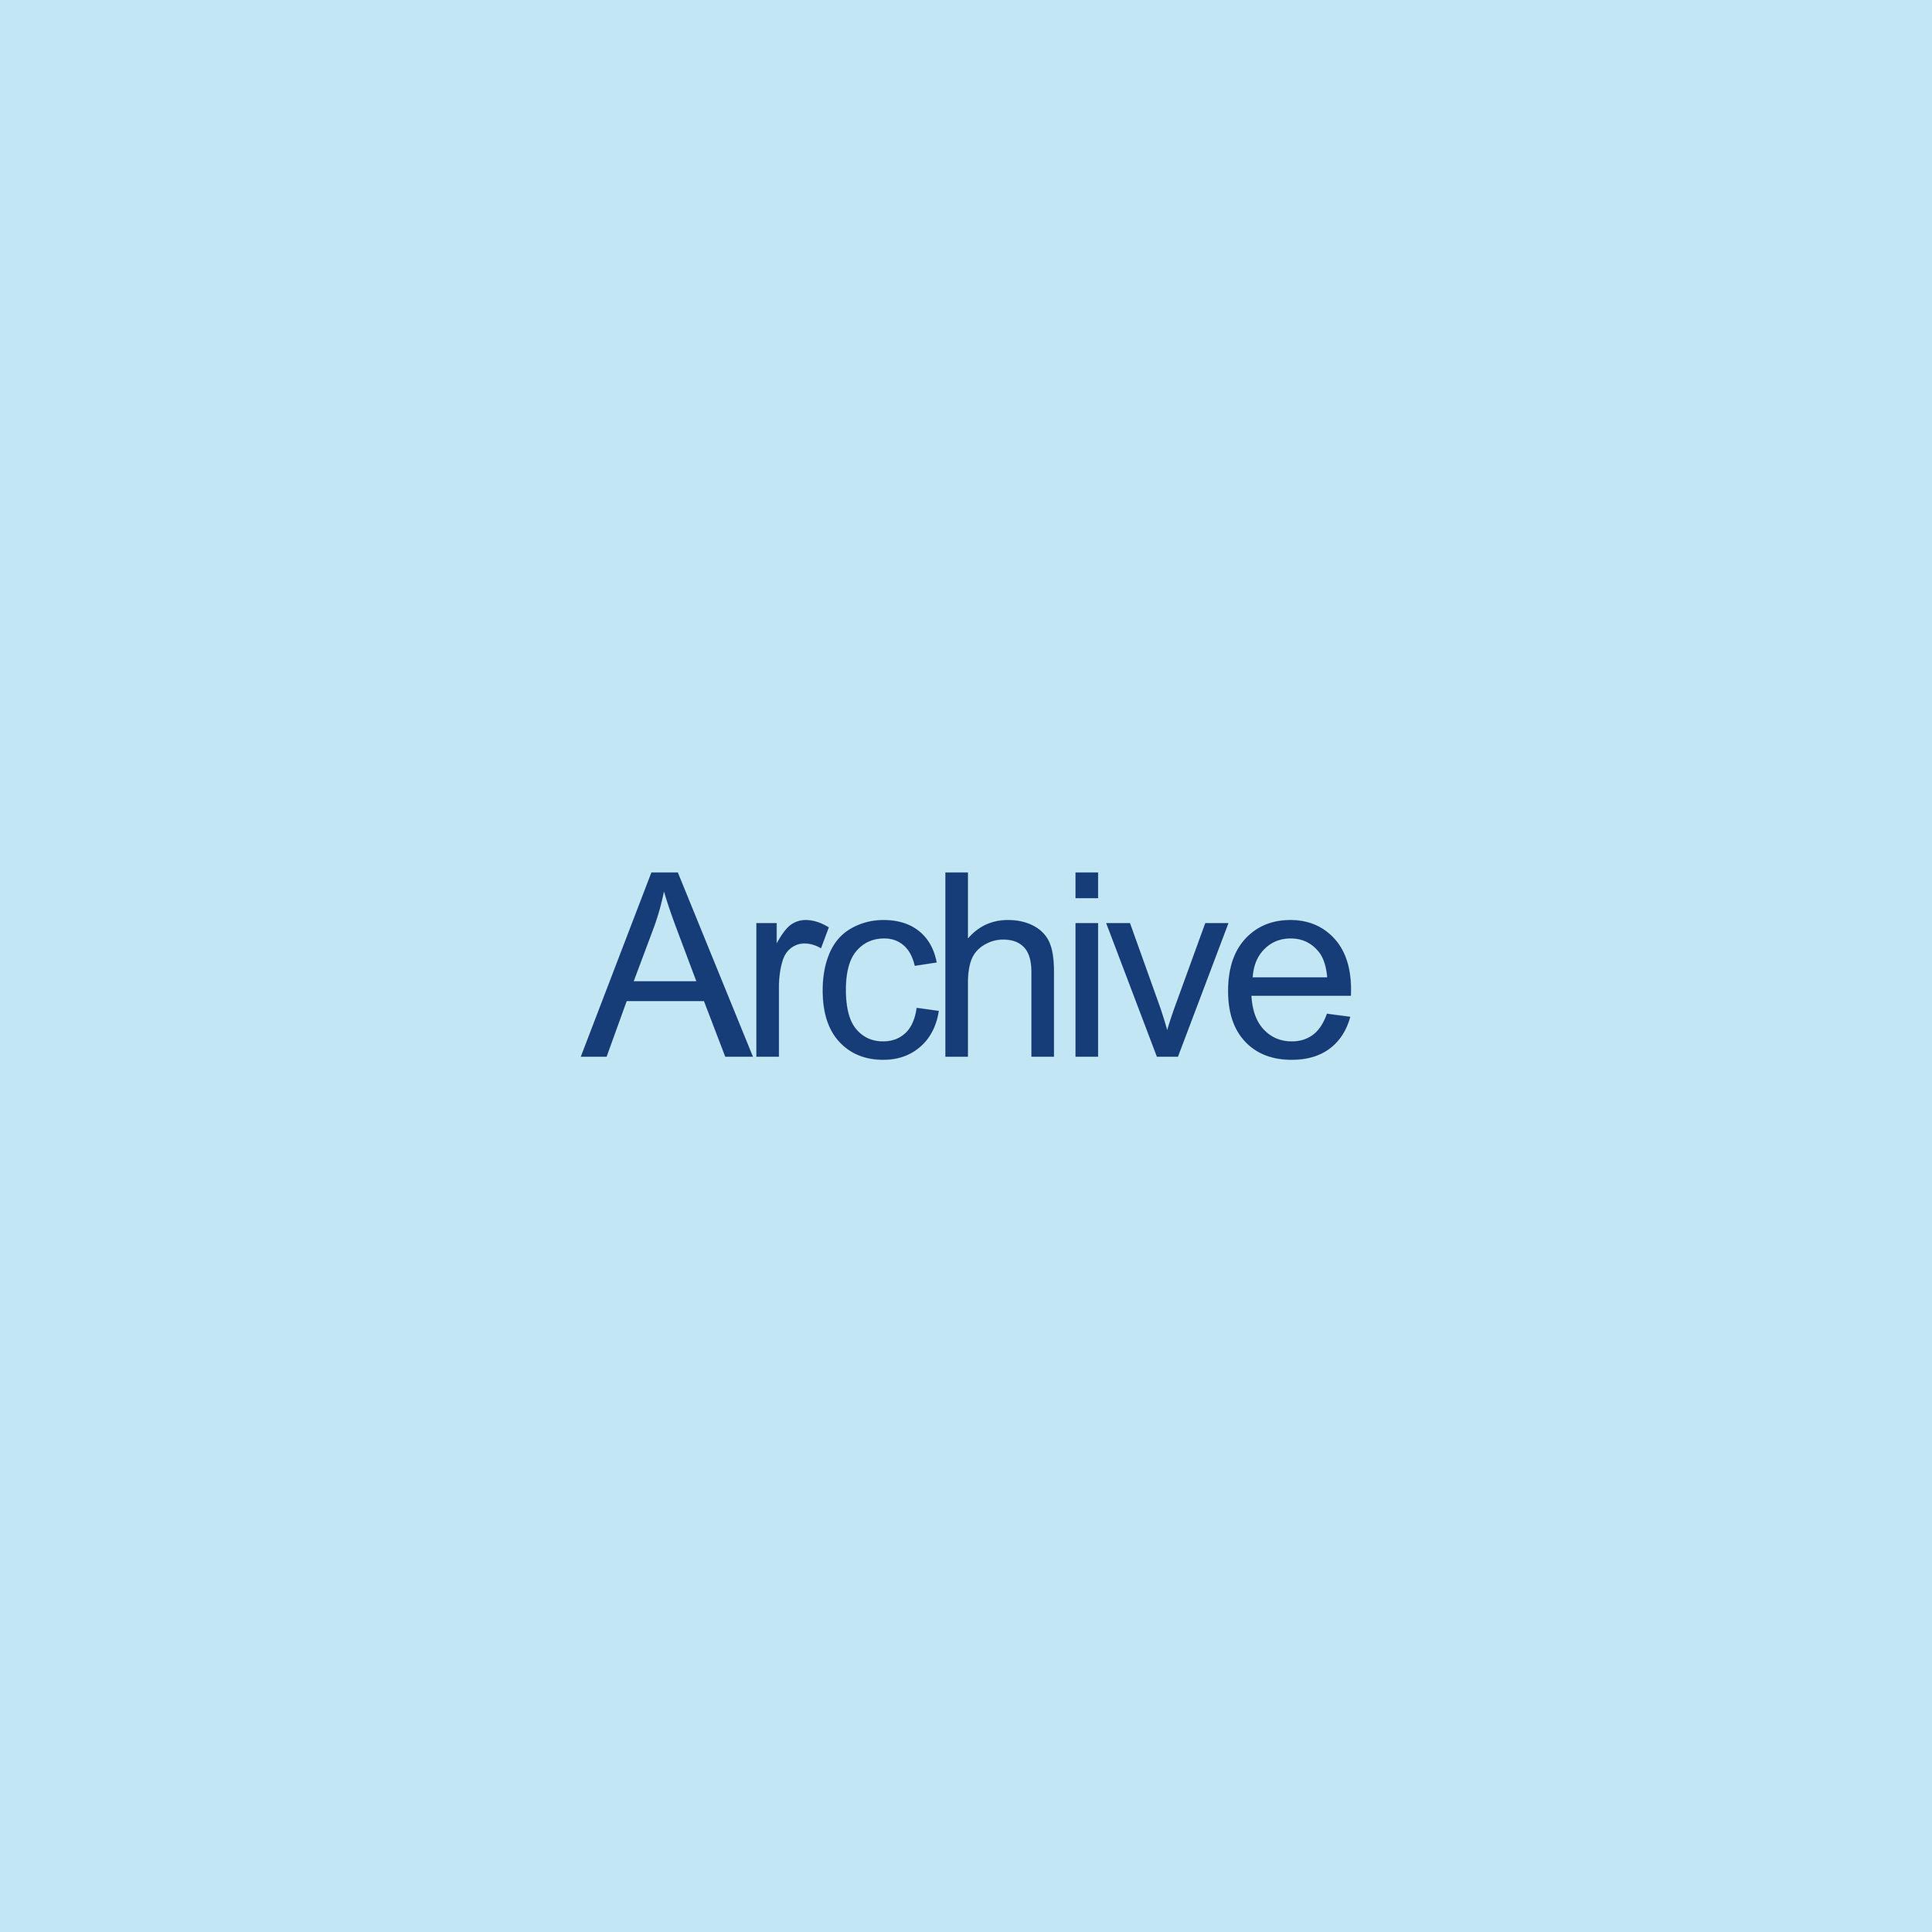 archive-arial.jpg